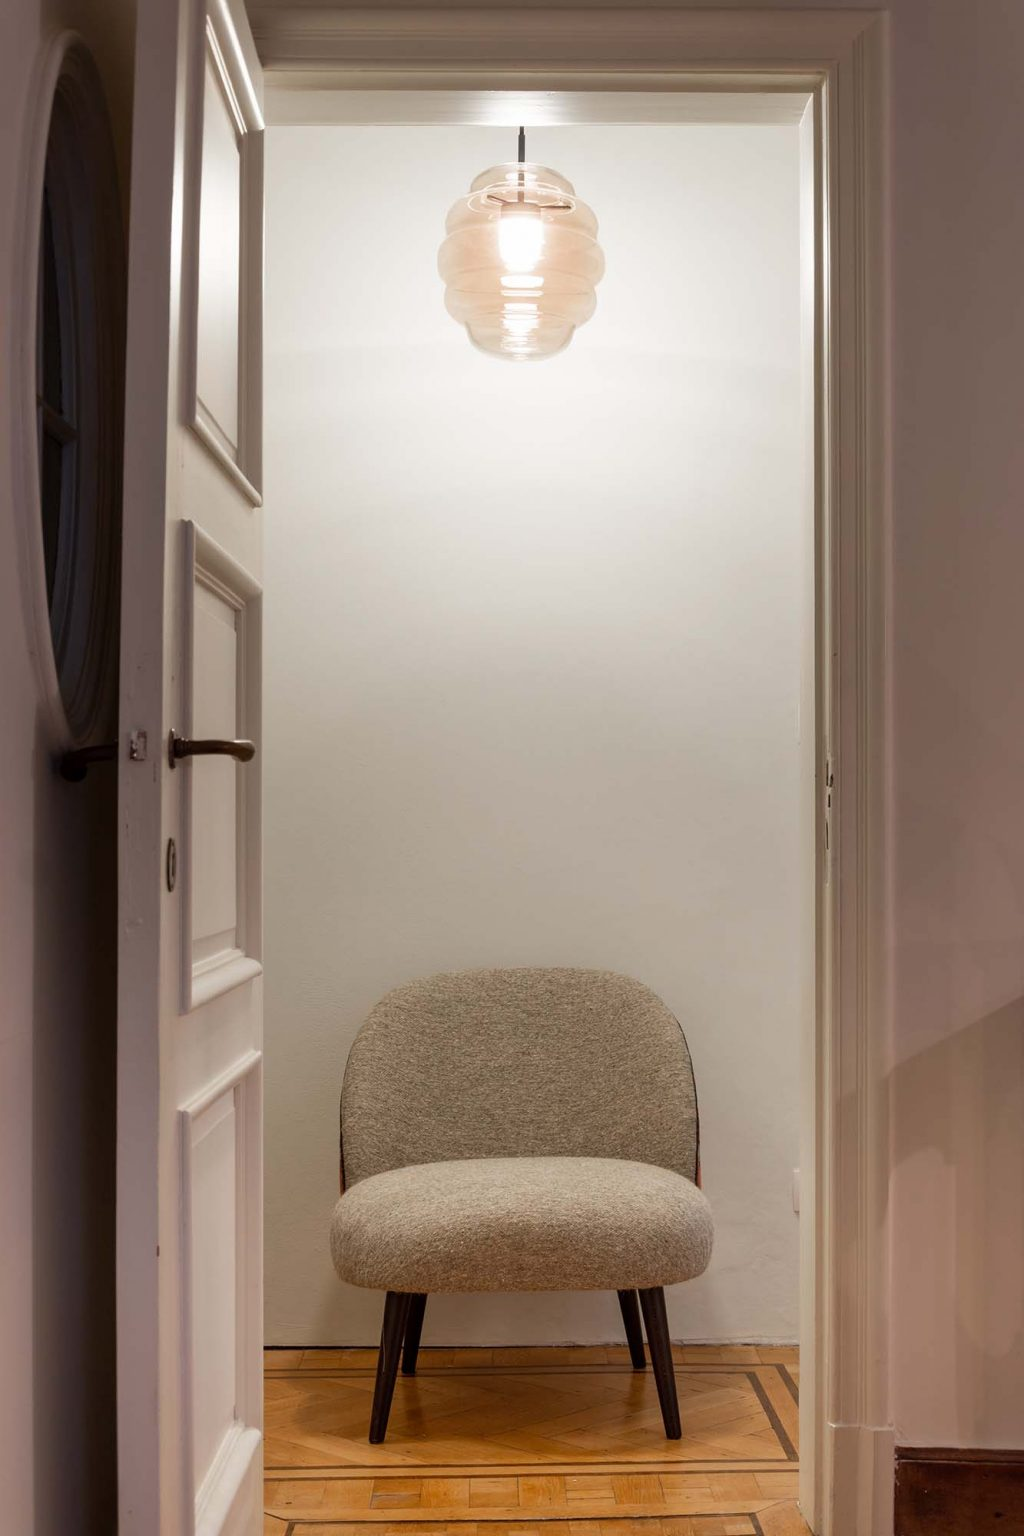 Biennale Interieur - Belgium's leading design and interior event - Petite-resa-vilma-blimp.jpg